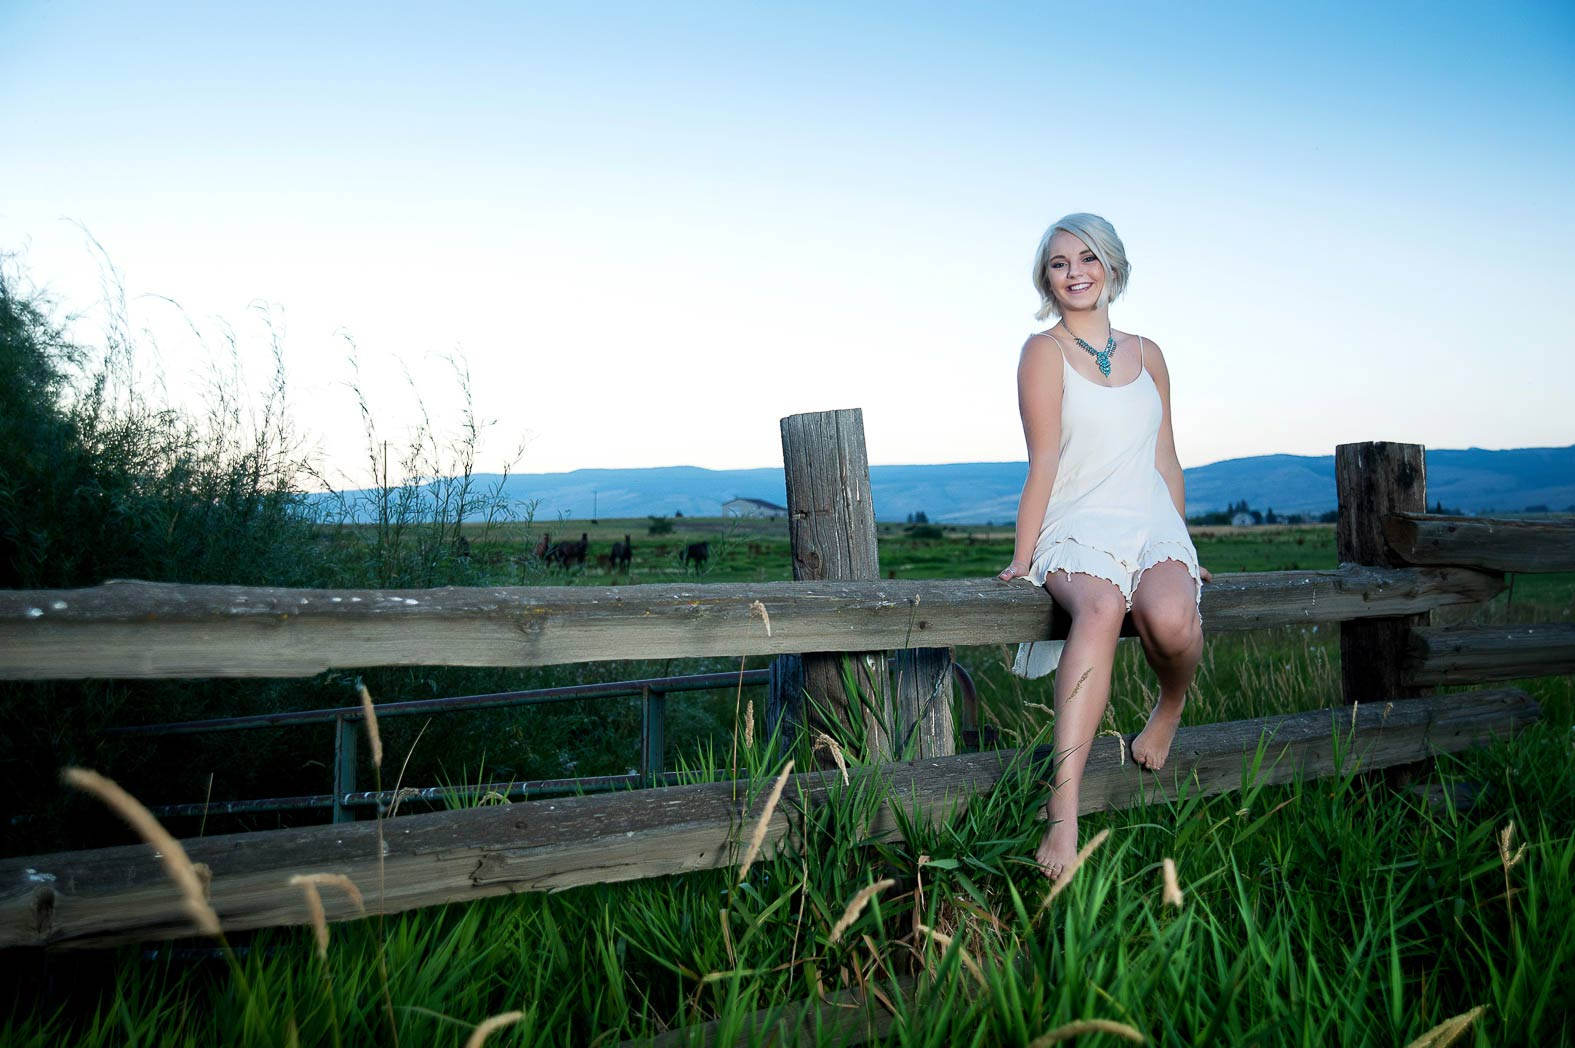 karina-country-girl-senior-pictures-farm-photonuvo